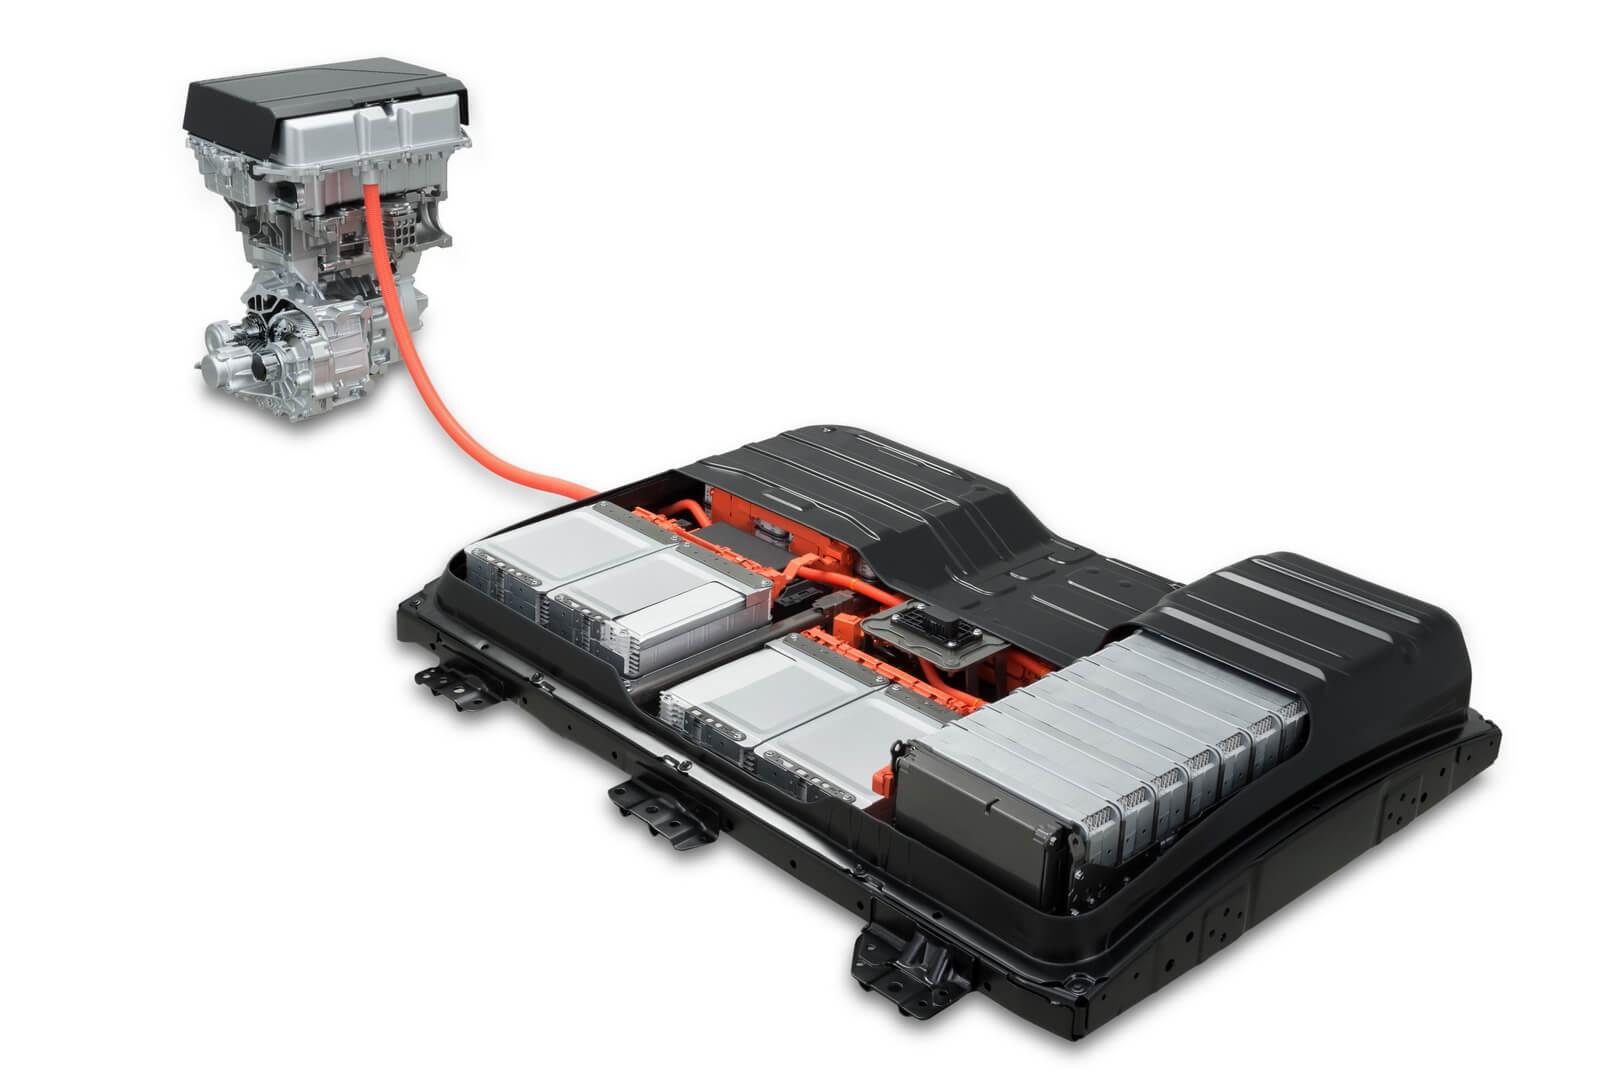 Аккумуляторная батарея с двигателем в Leaf 2018